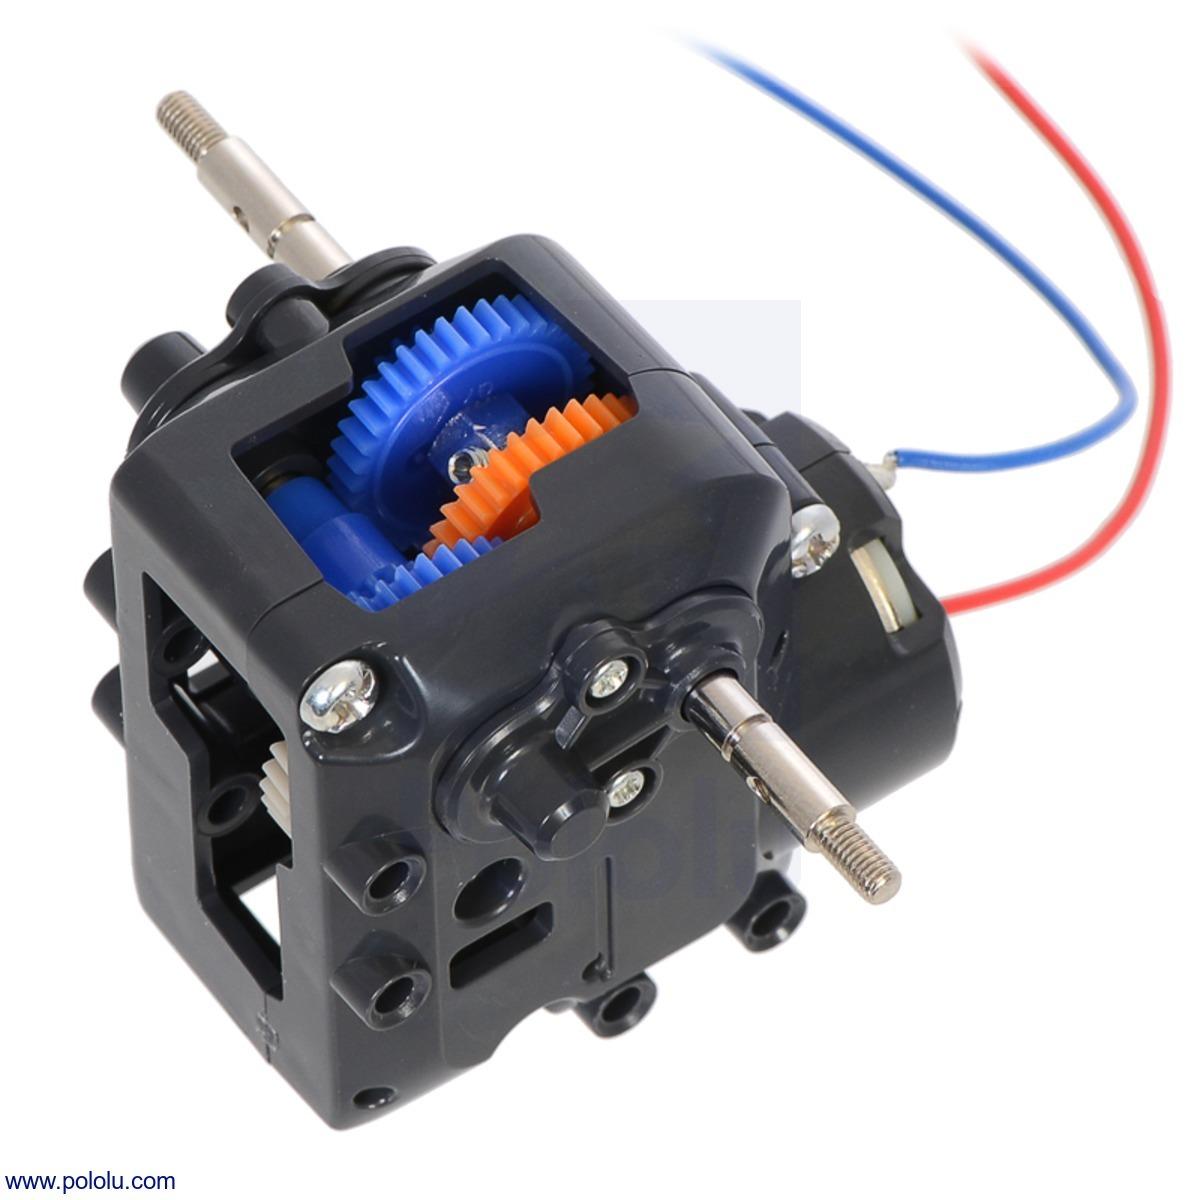 Tamiya 72008 4-Speed Worm Gearbox Kit